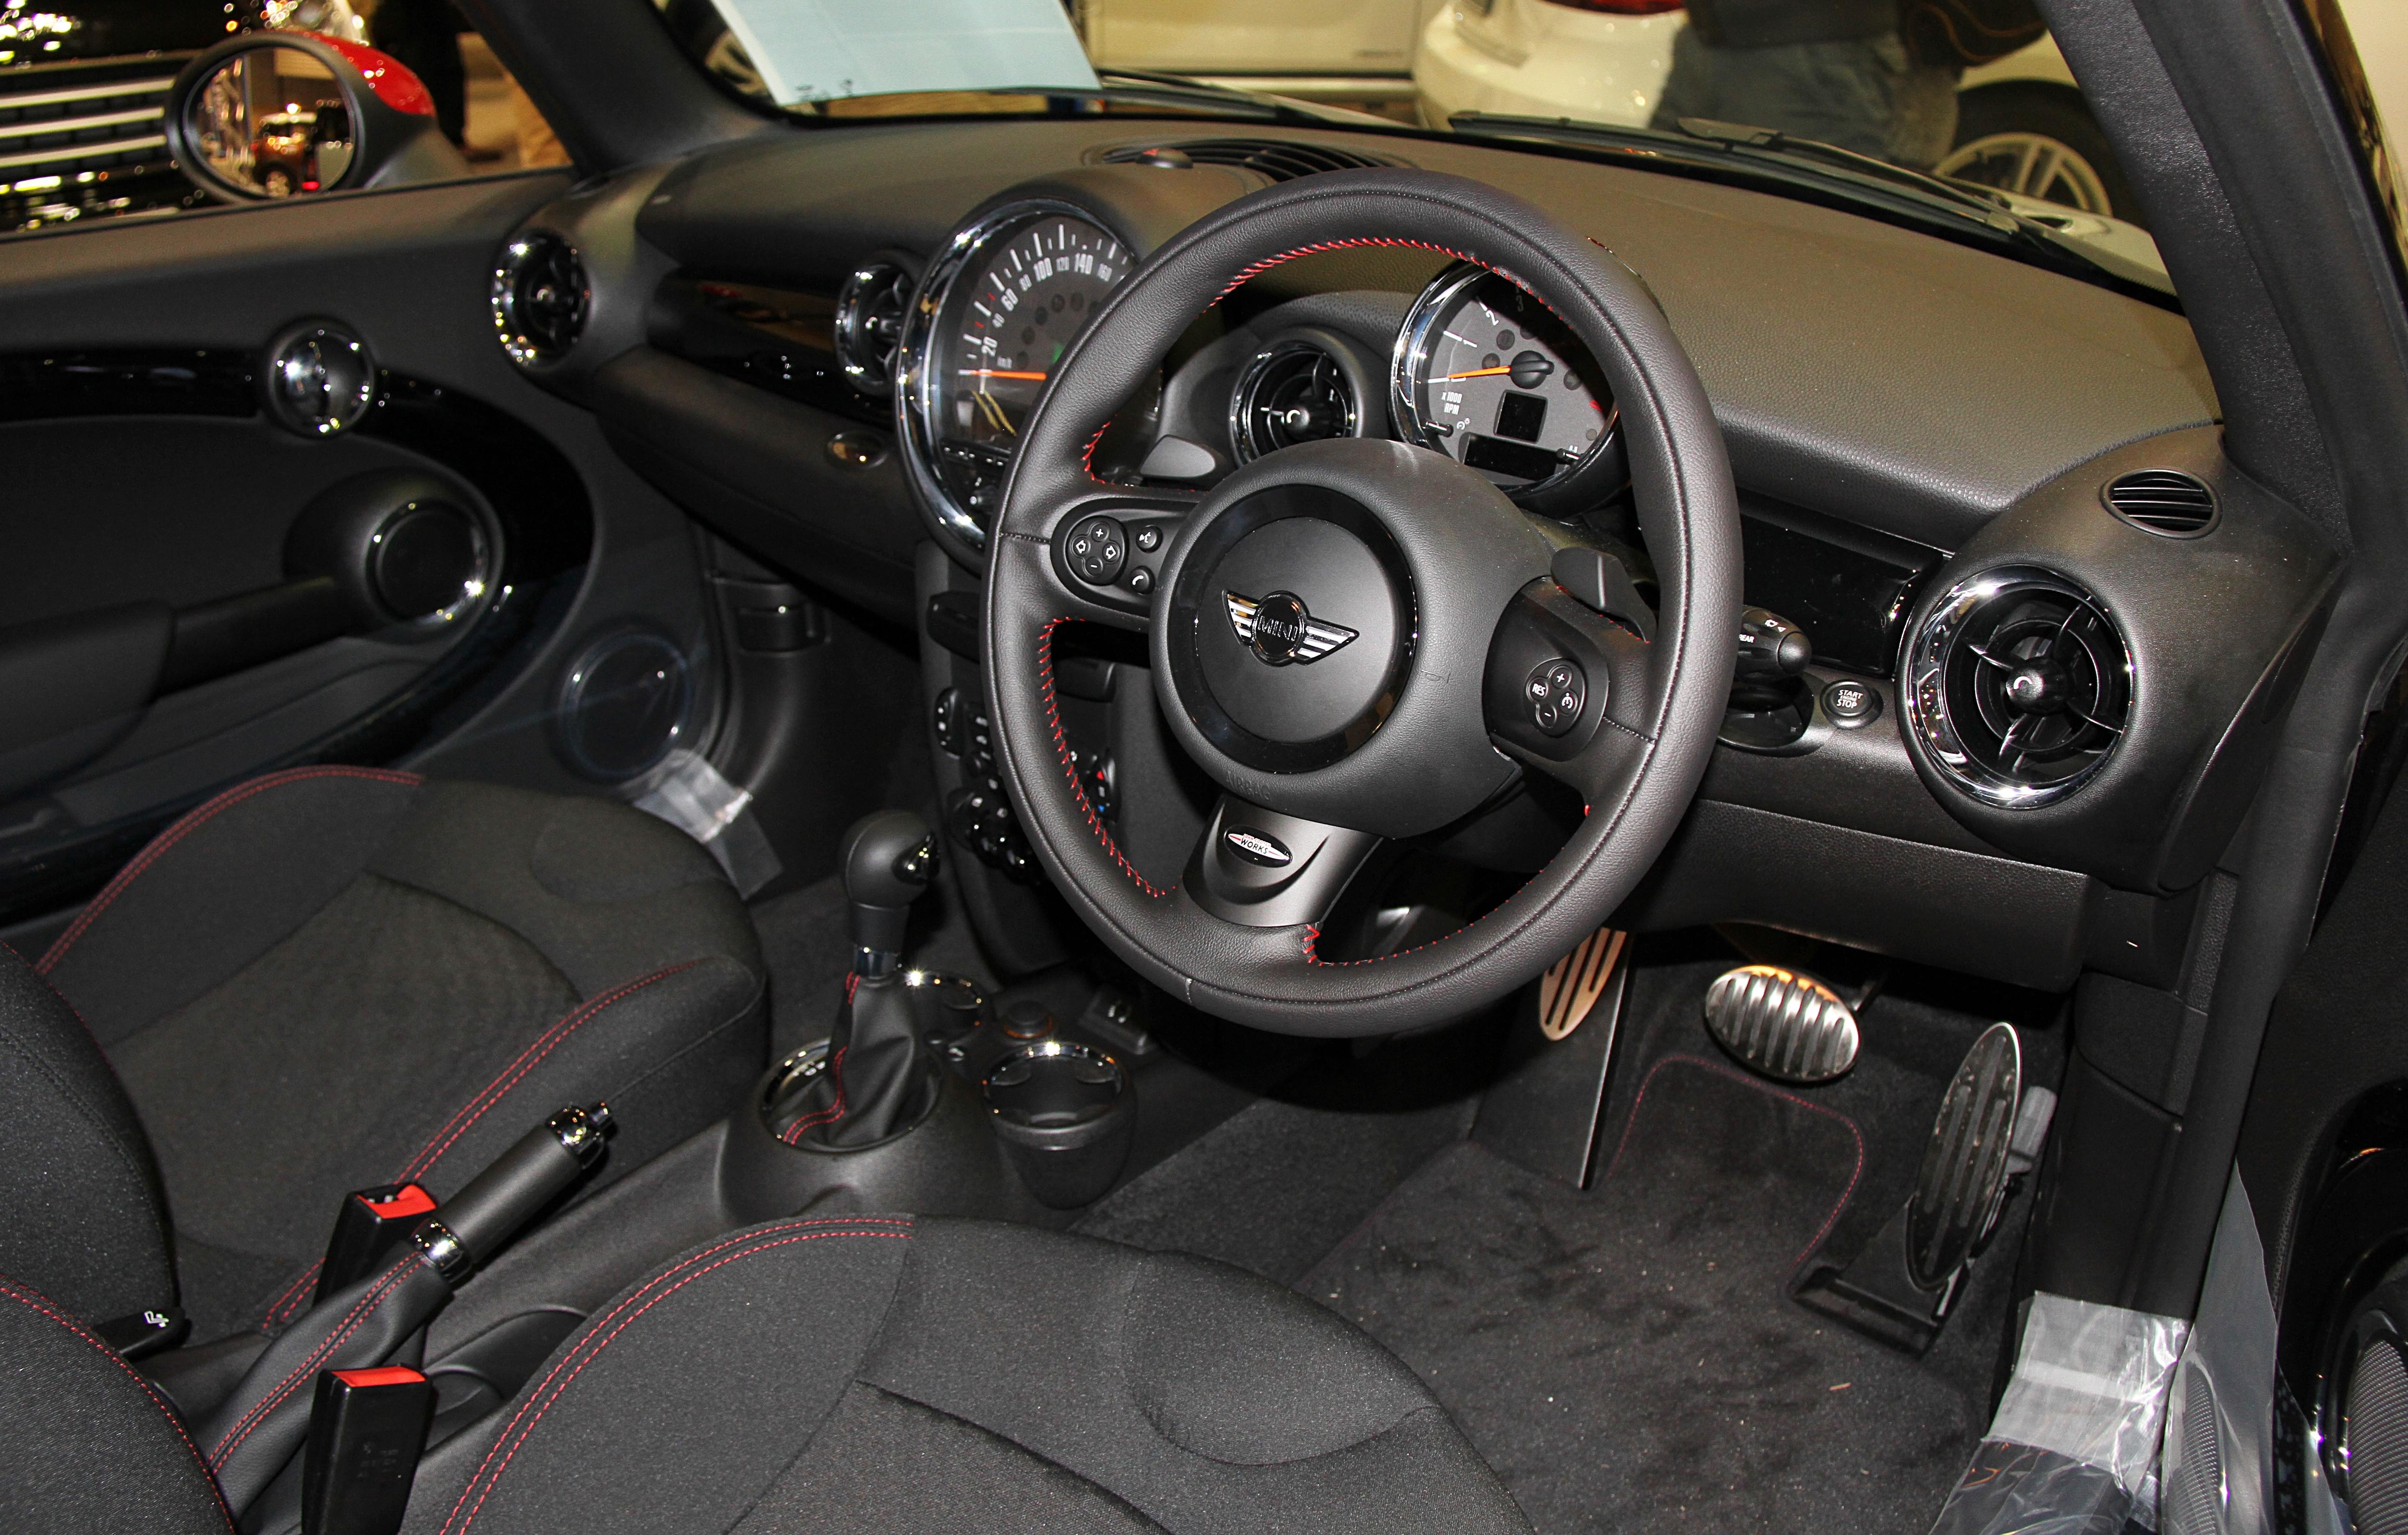 Mini Cooper R56 Interior идеи изображения автомобиля